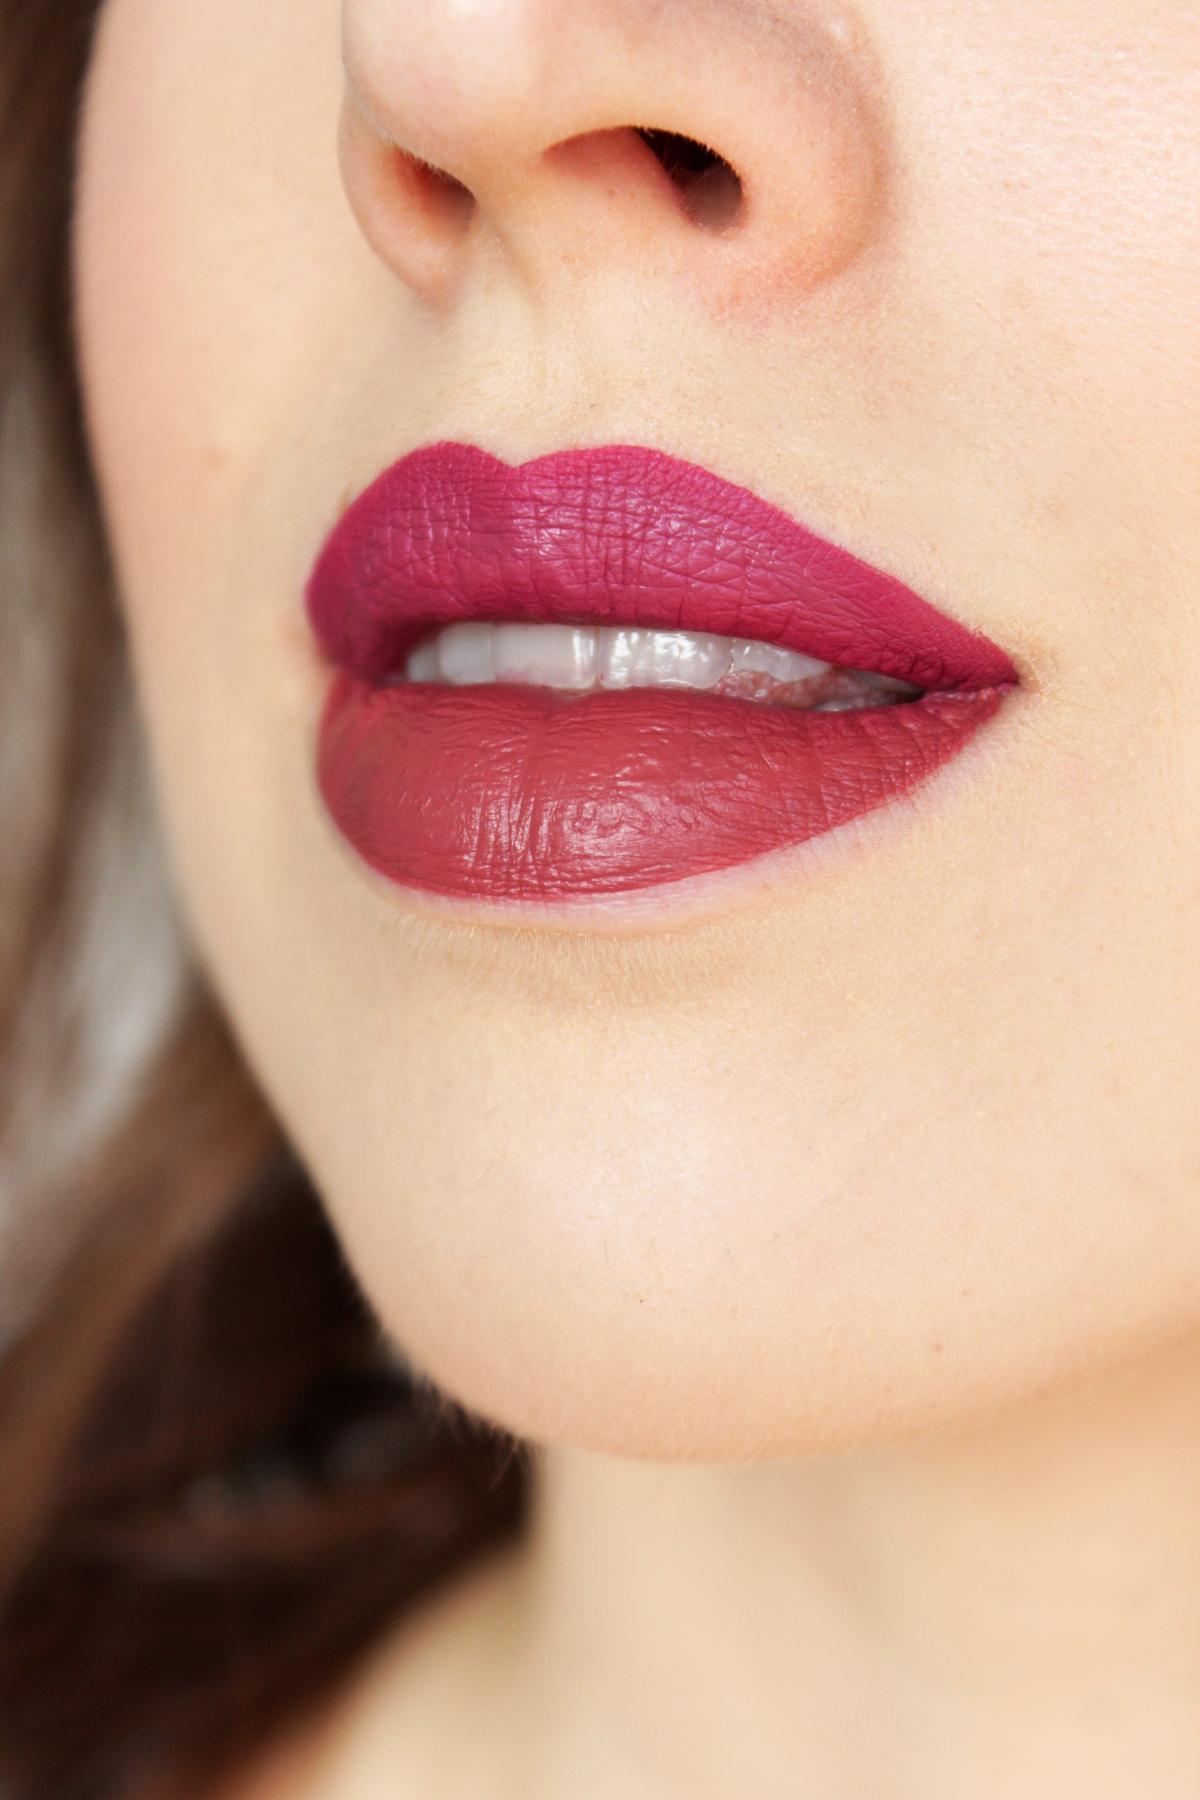 Colourpop Liquid Lips Vergleich